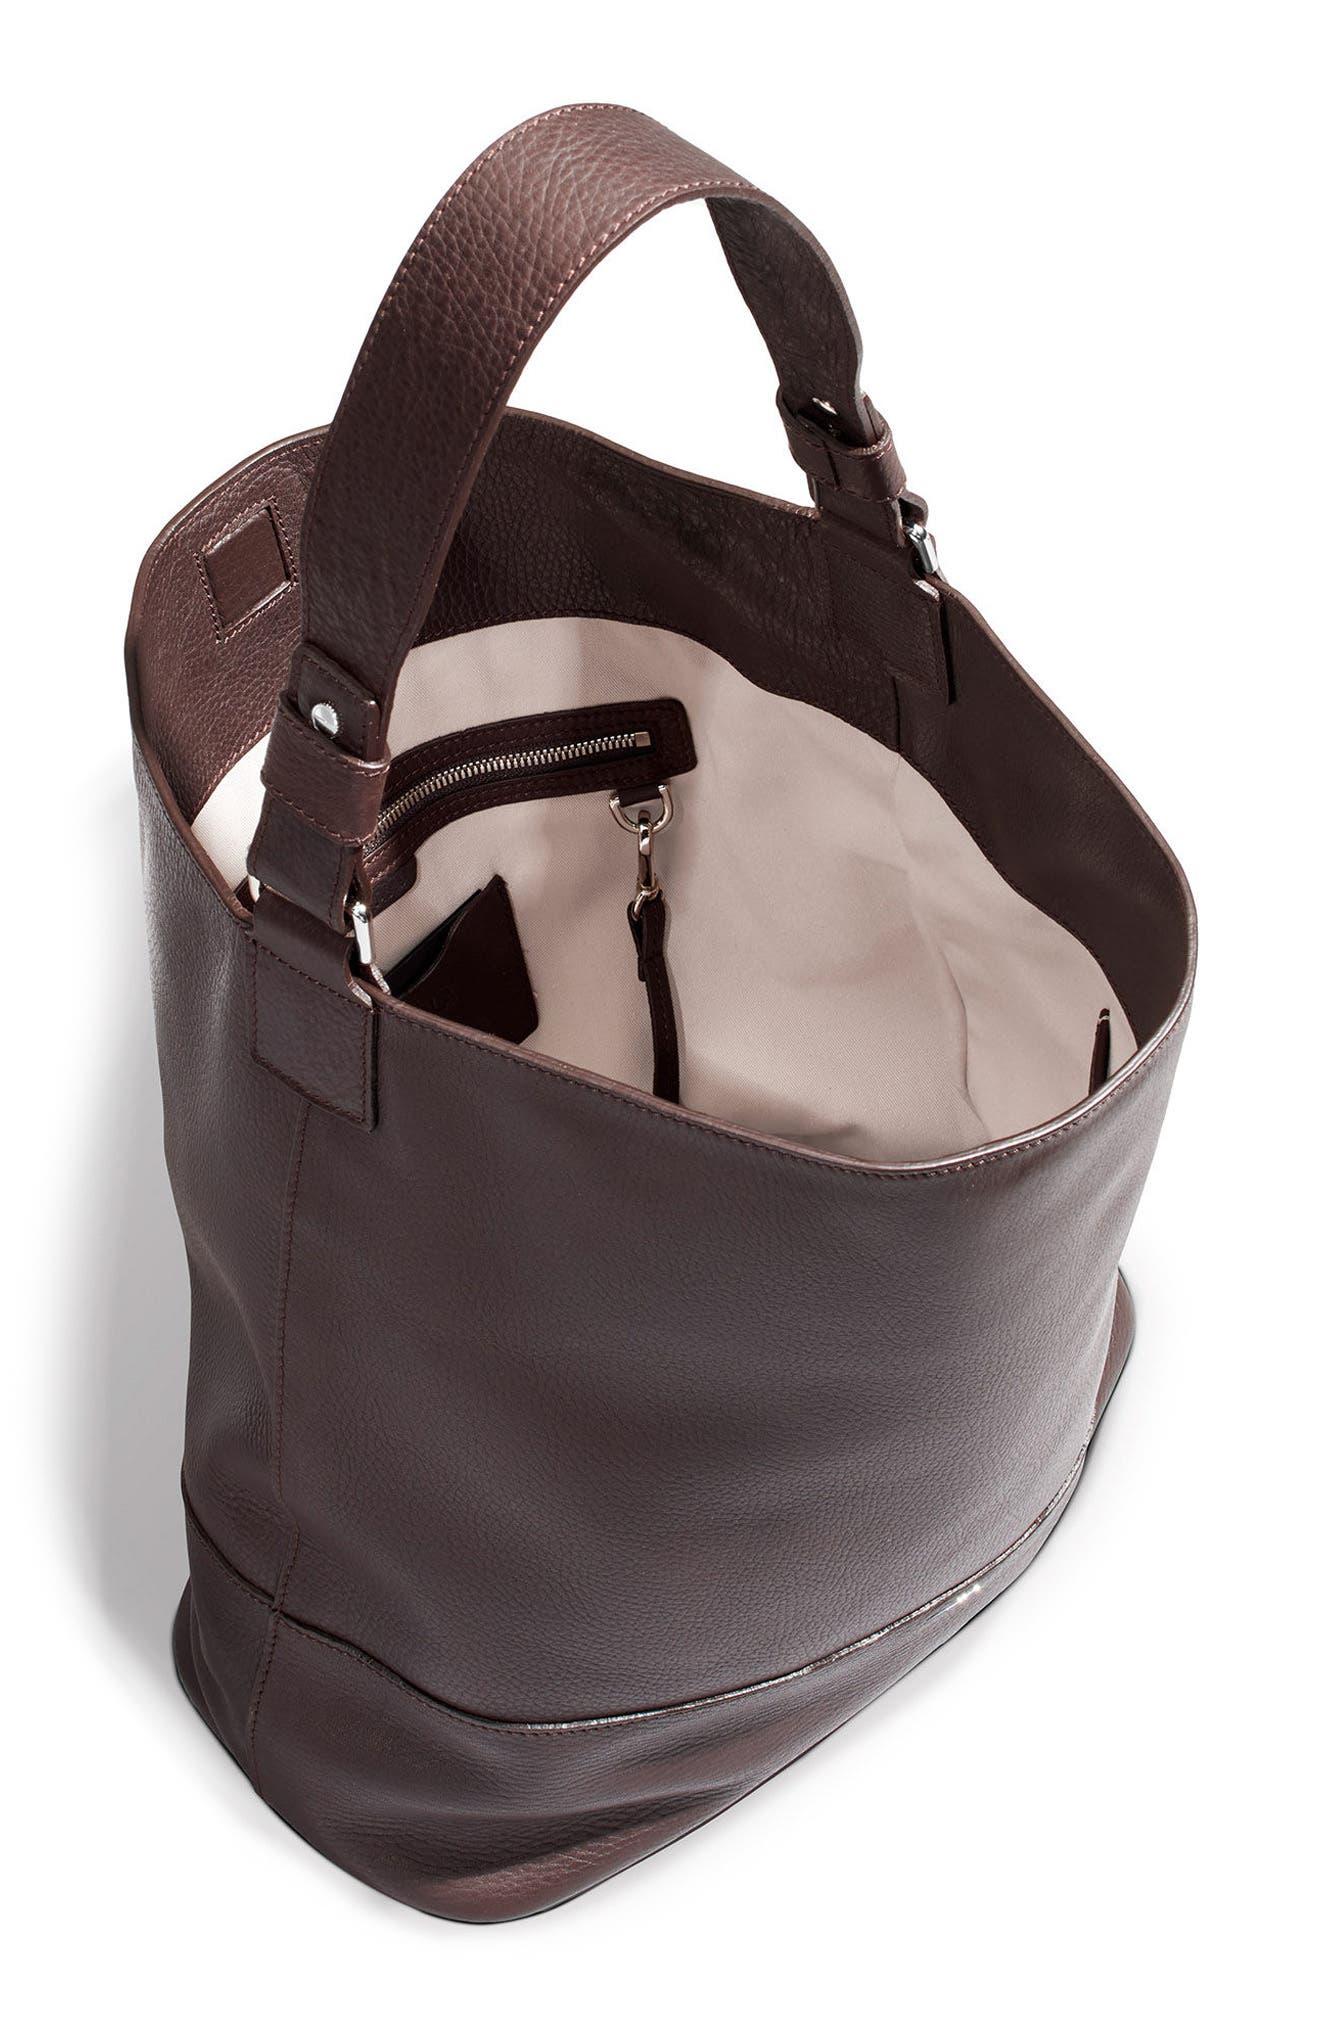 Relaxed Calfskin Leather Hobo Bag,                             Alternate thumbnail 7, color,                             240